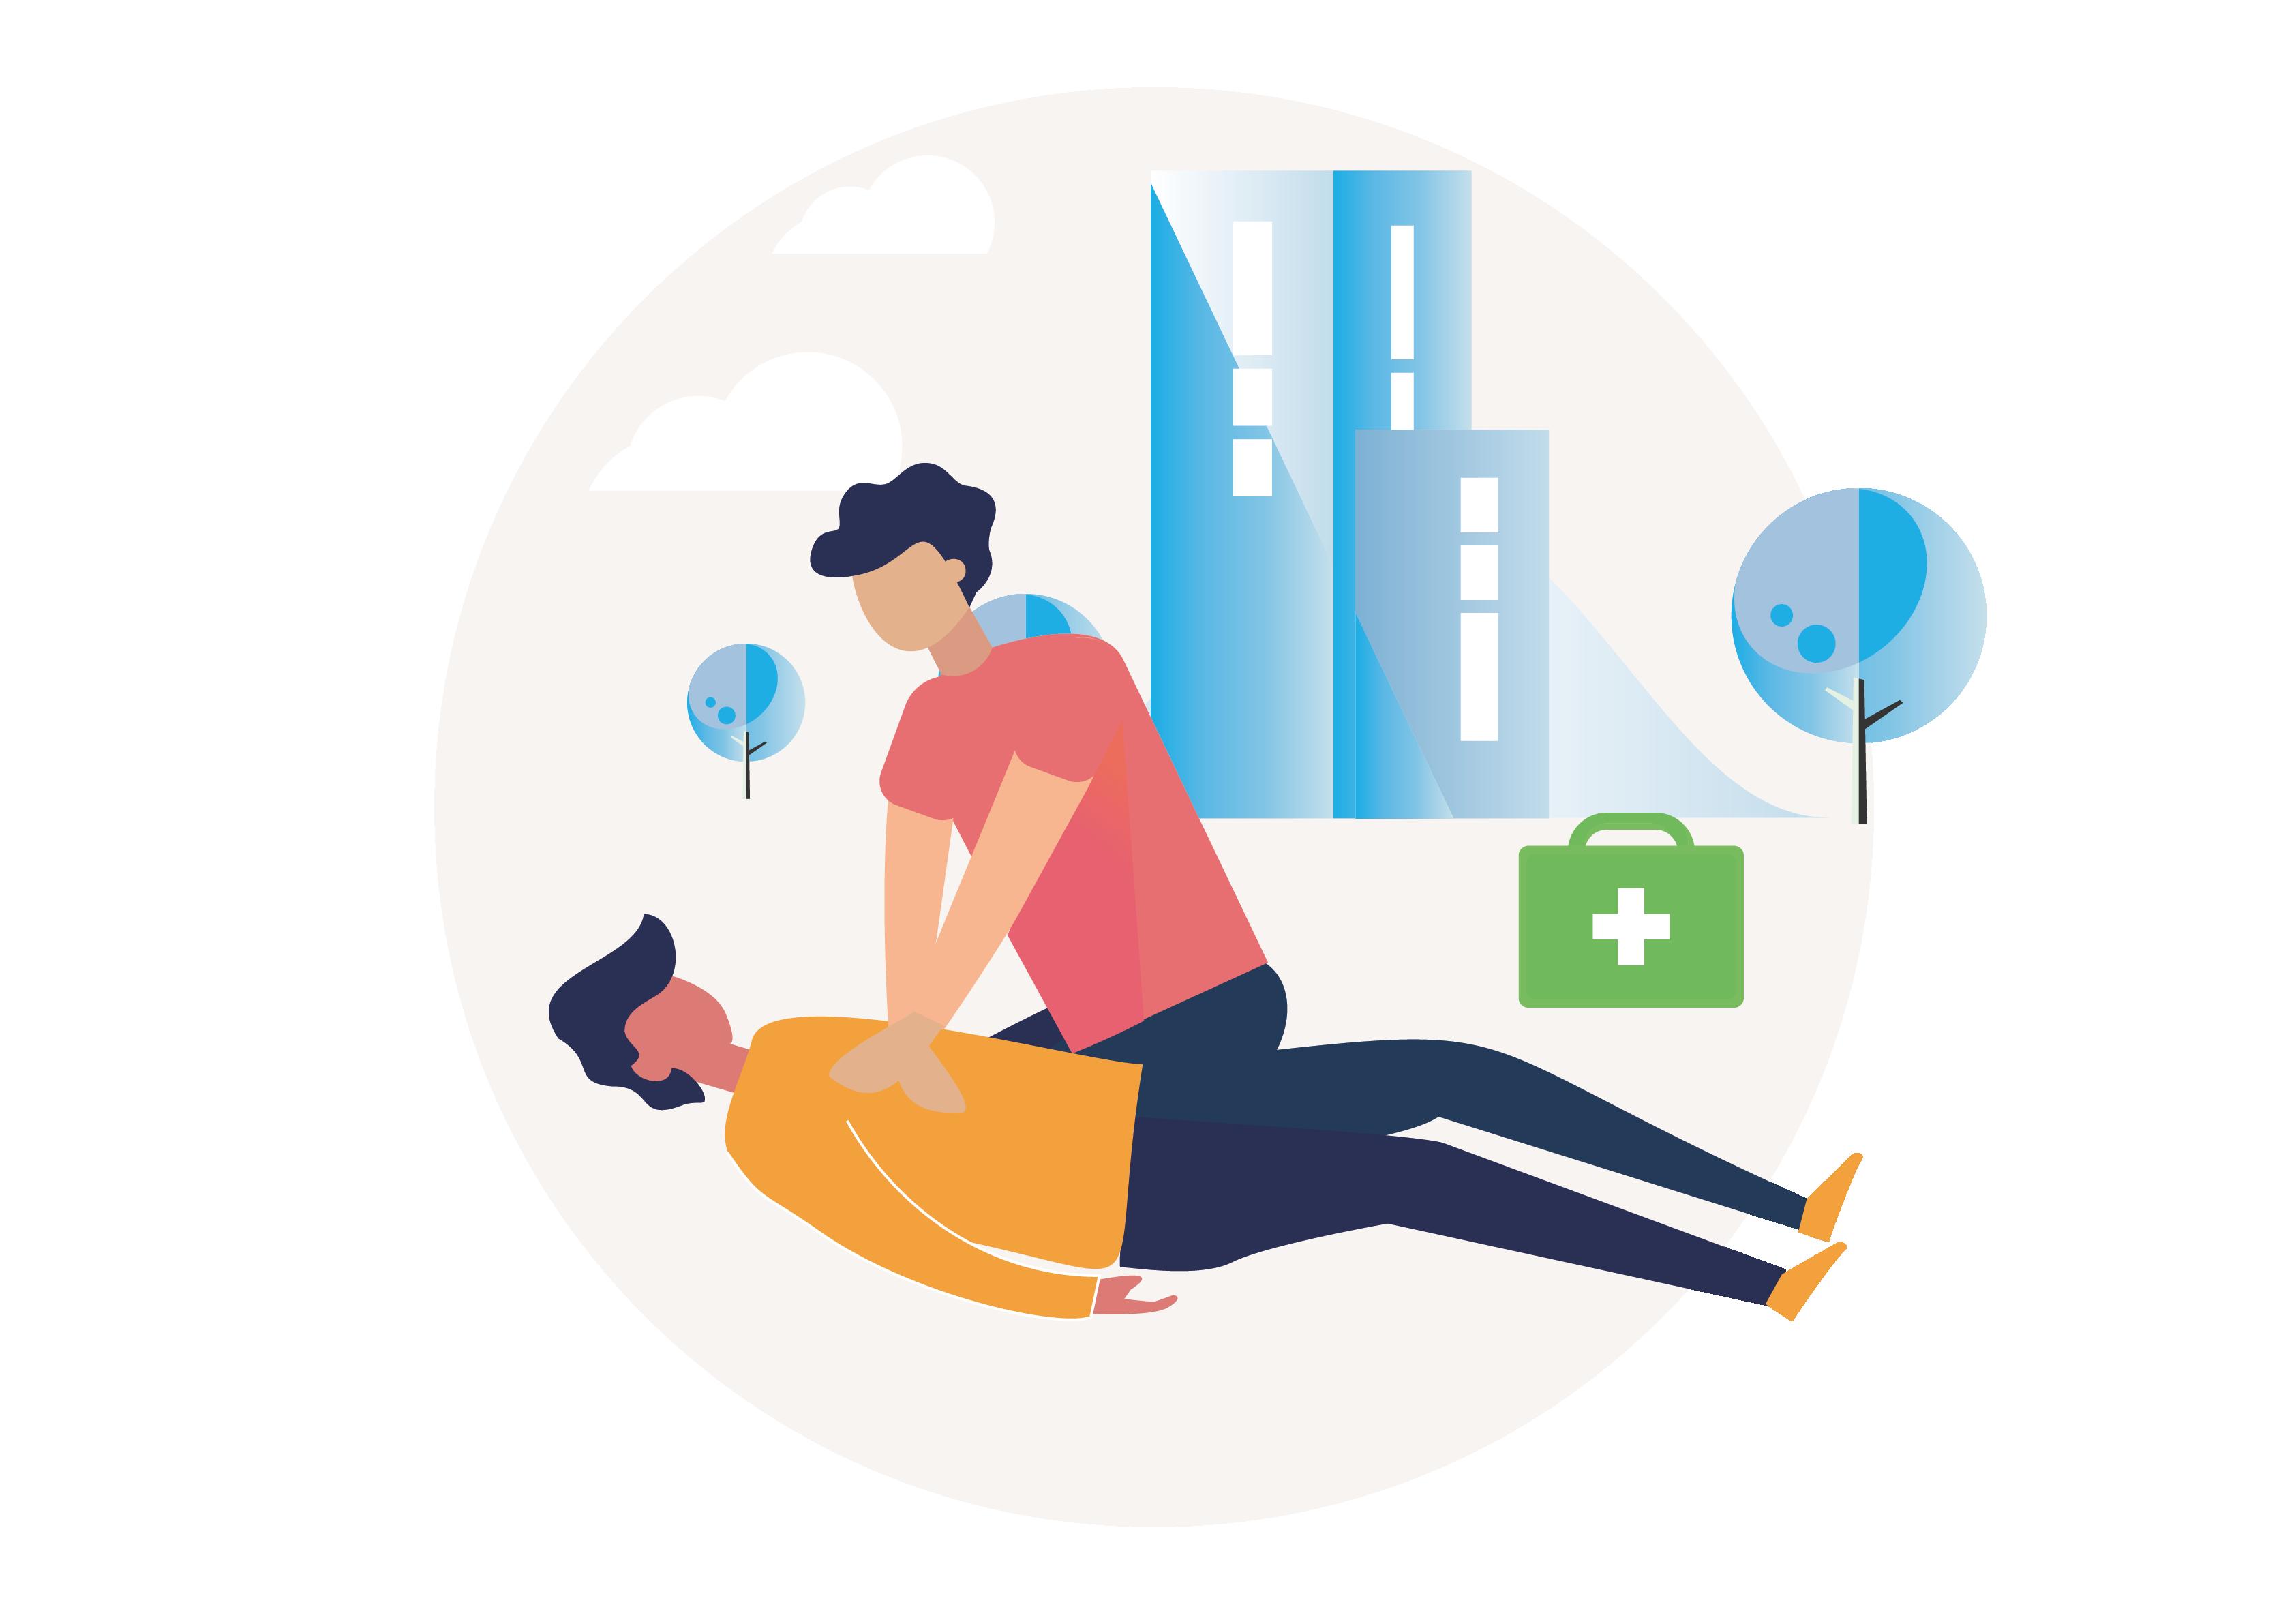 Illustration_Urgence_Massage_Cardiaque